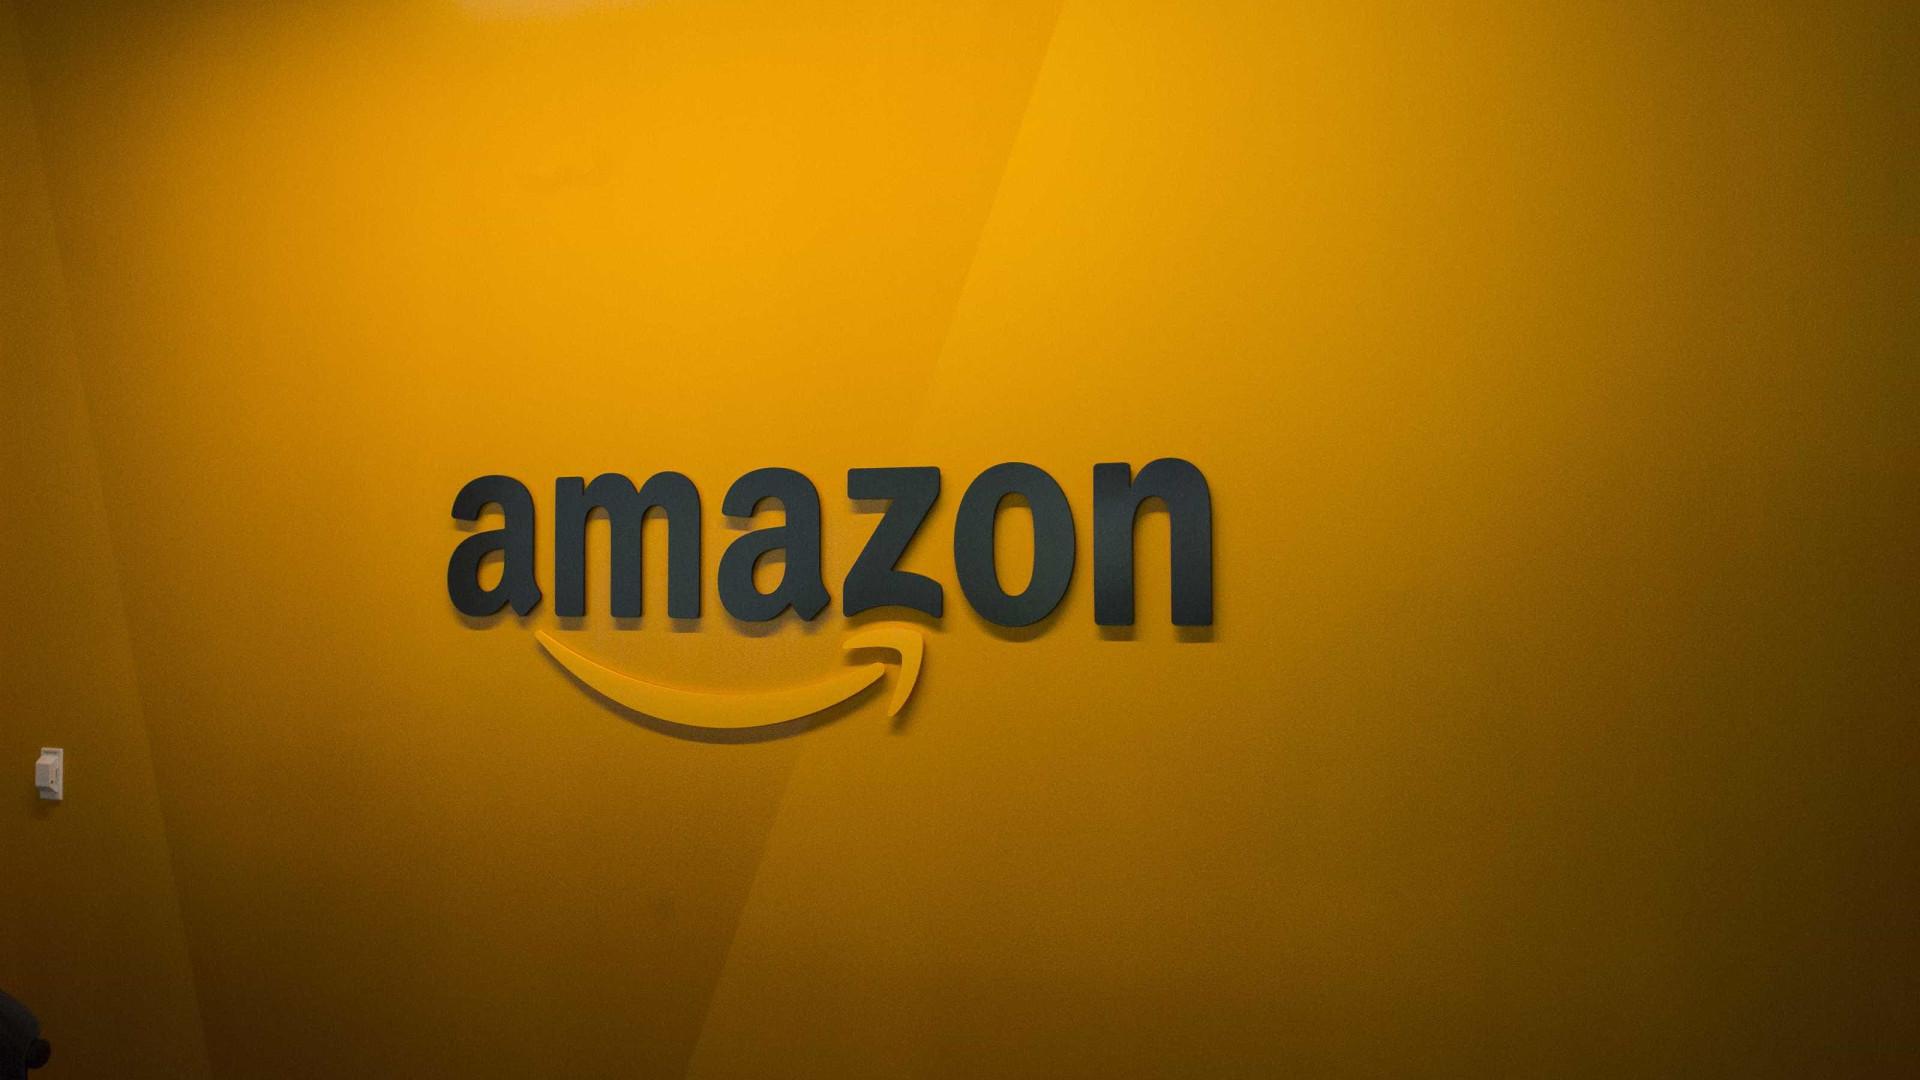 Amazon pede desculpas após negar que entregadores urinam em garrafas